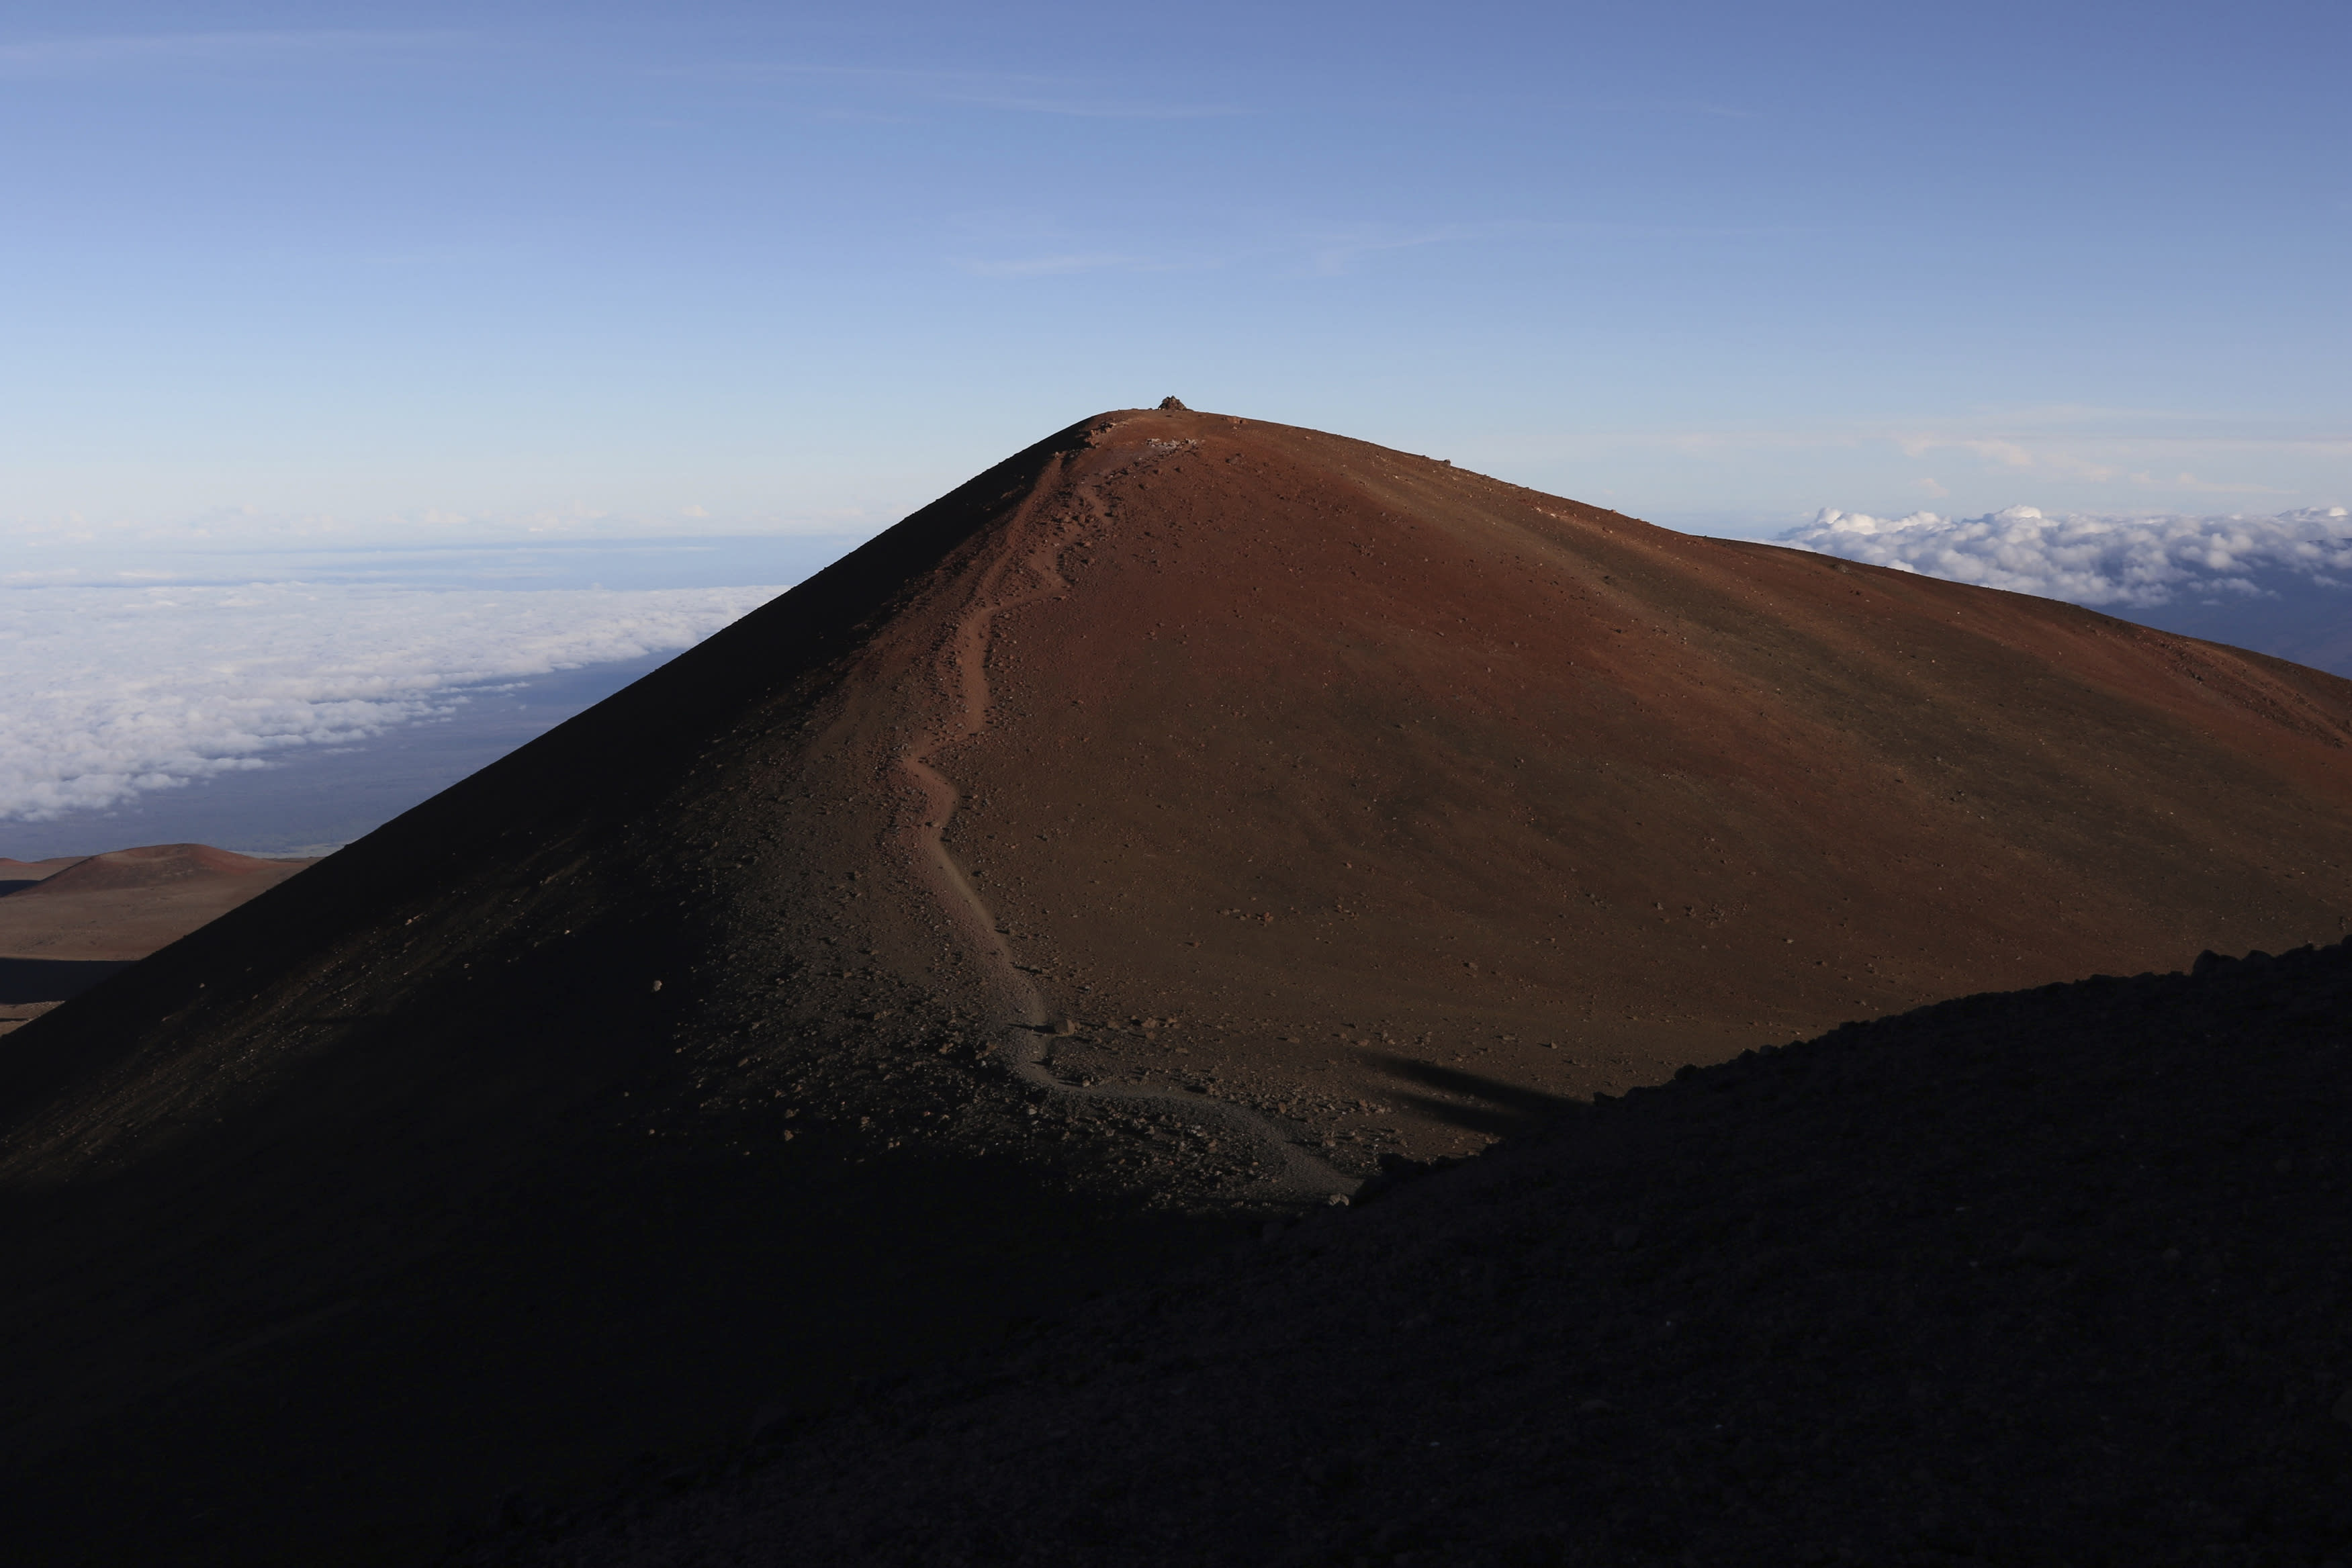 Giant Telescope Hawaiian Activism